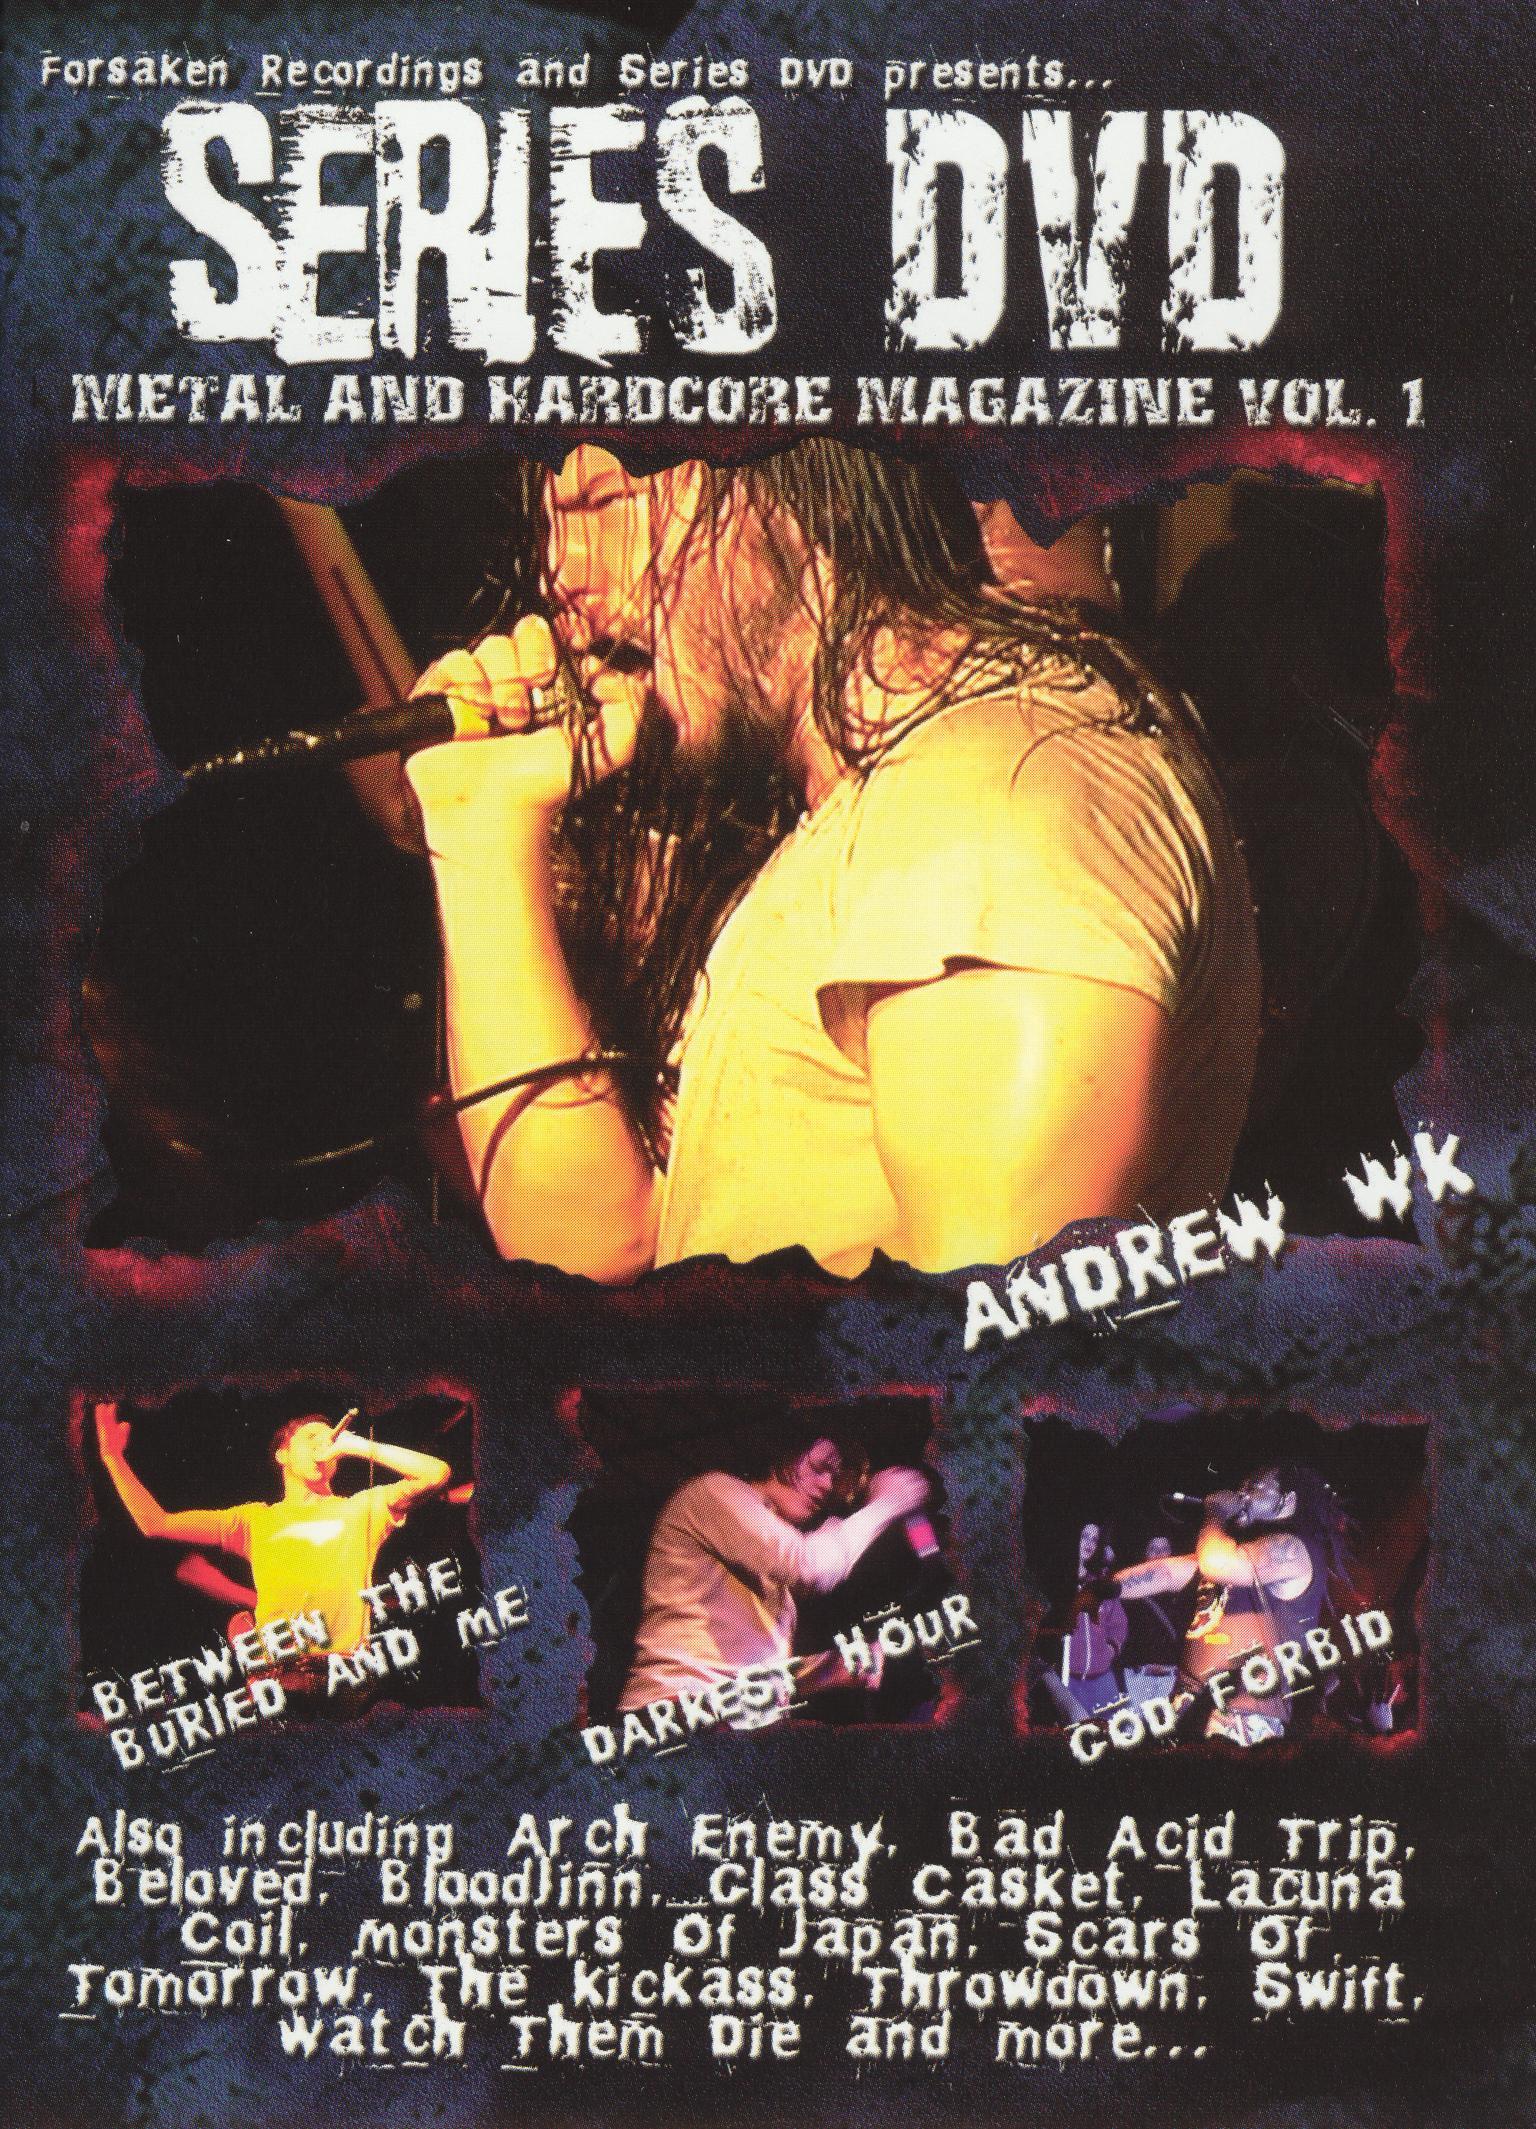 Series DVD: Metal and Hardcore, Vol. 1